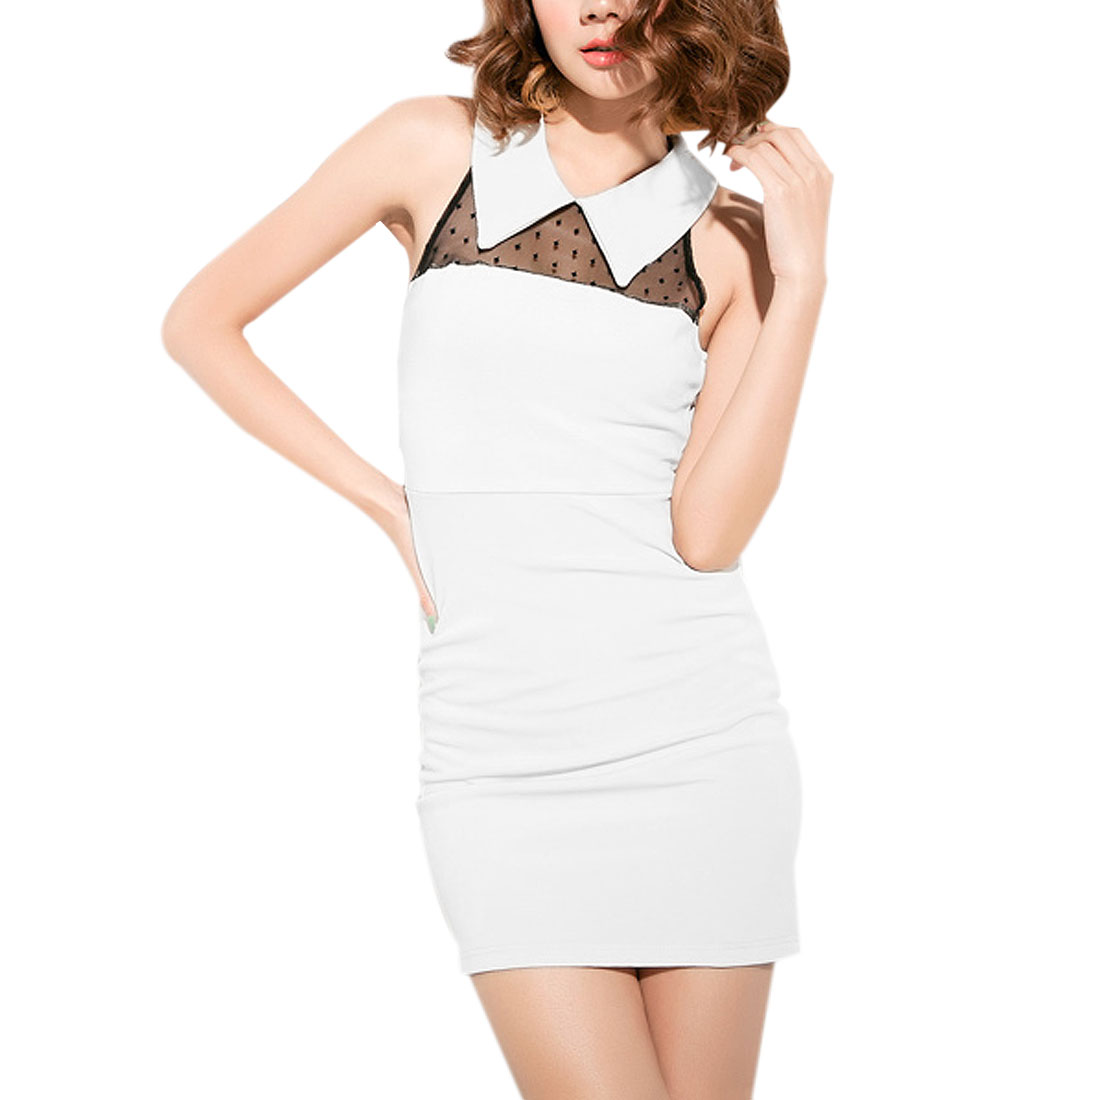 White Zipper Closure Sleeveless Semi Sheer Formfitting Summer Mini Dress for Ladies XS